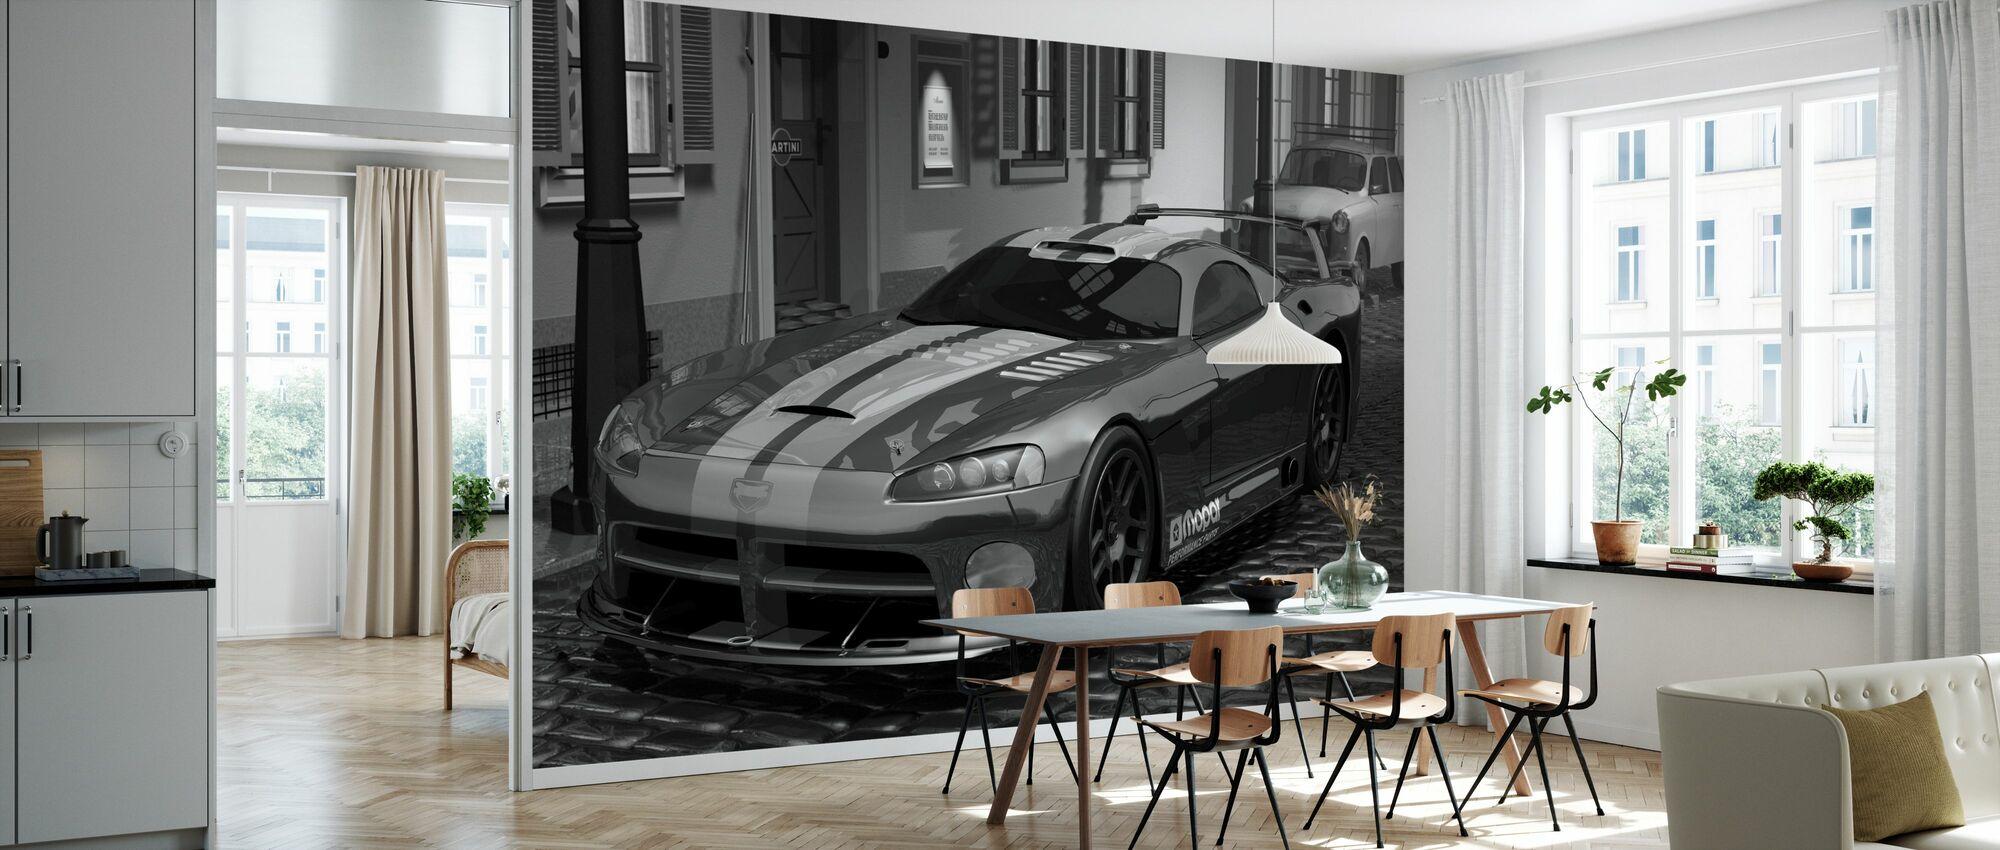 Red Fast Car BW - Wallpaper - Kitchen